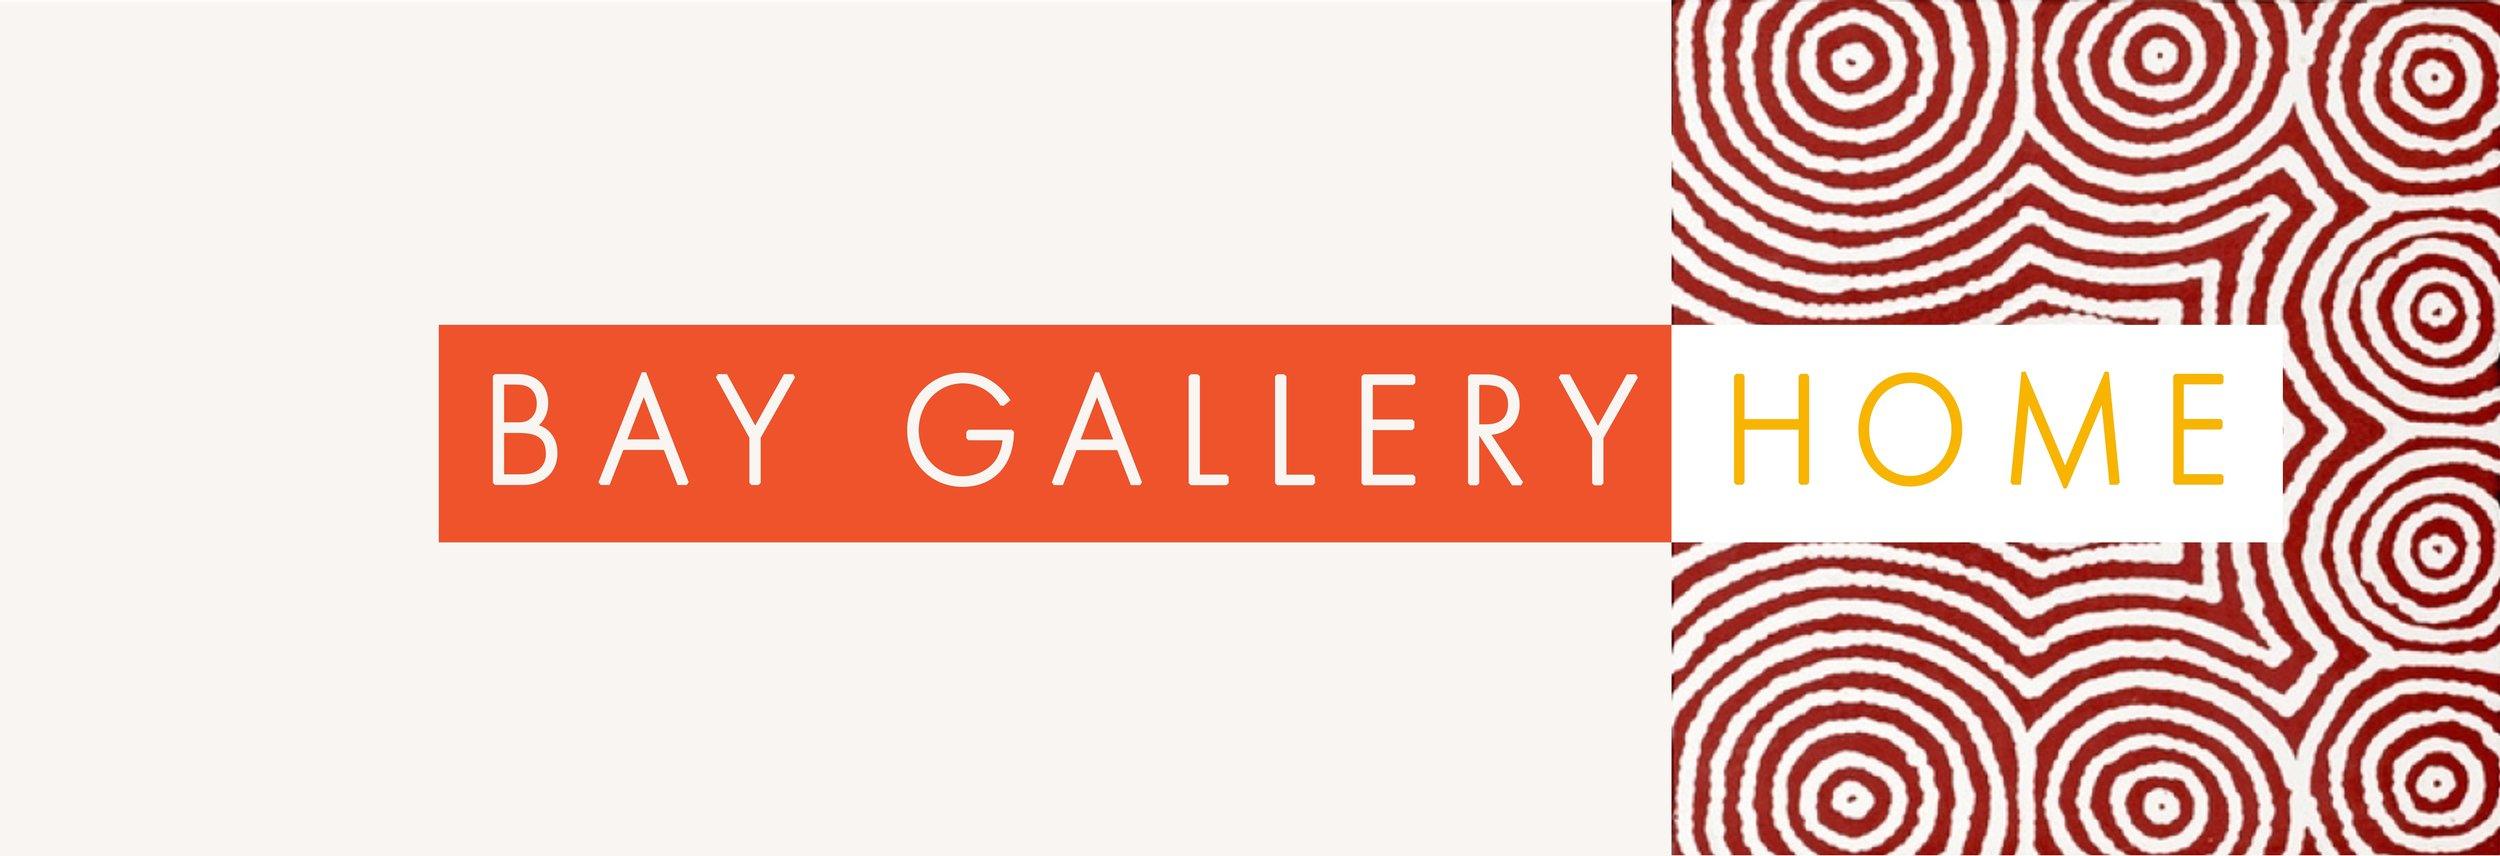 Bay Gallery Home, Australian Aboriginal Art, Wallpaper, Tiles, Rugs. Design with Origin.